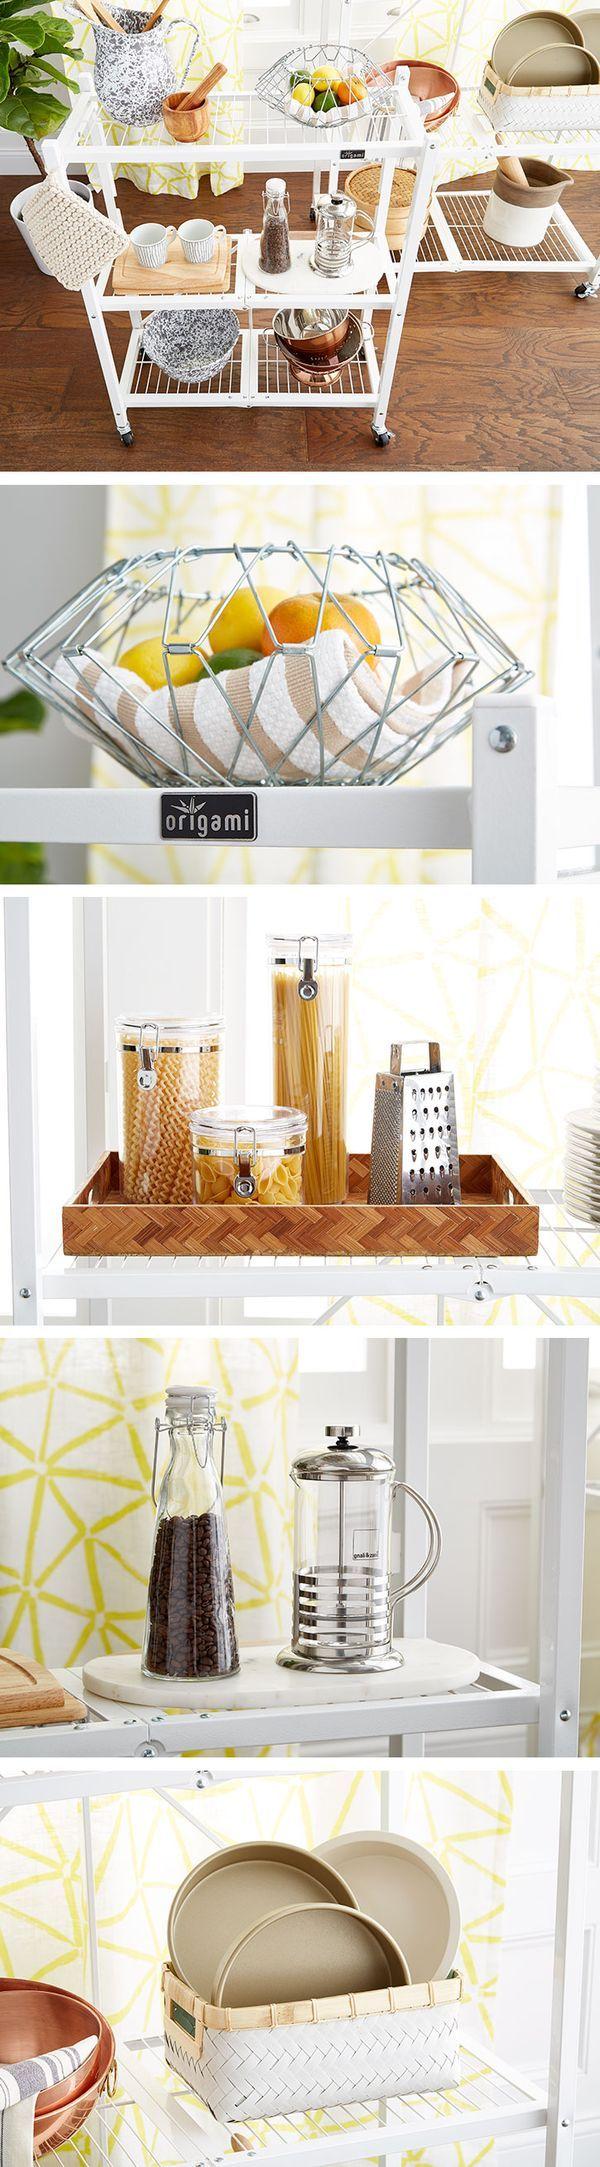 109 best shelving images on pinterest container shop container origami 3 shelf folding rack jeuxipadfo Images